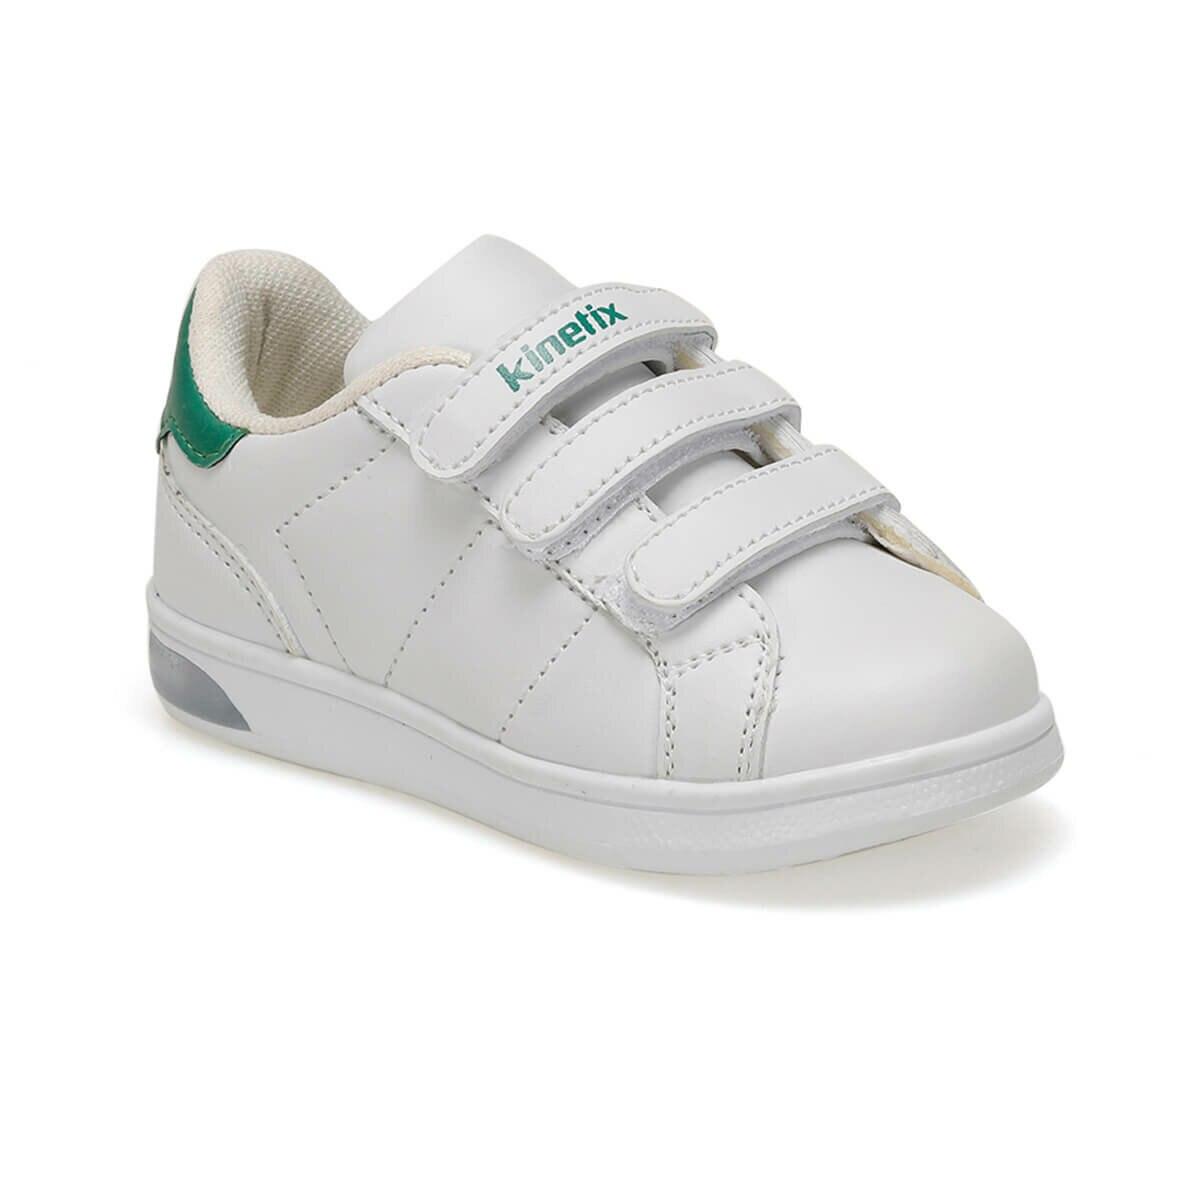 FLO PLAIN J 9PR White Male Child Sneaker Shoes KINETIX